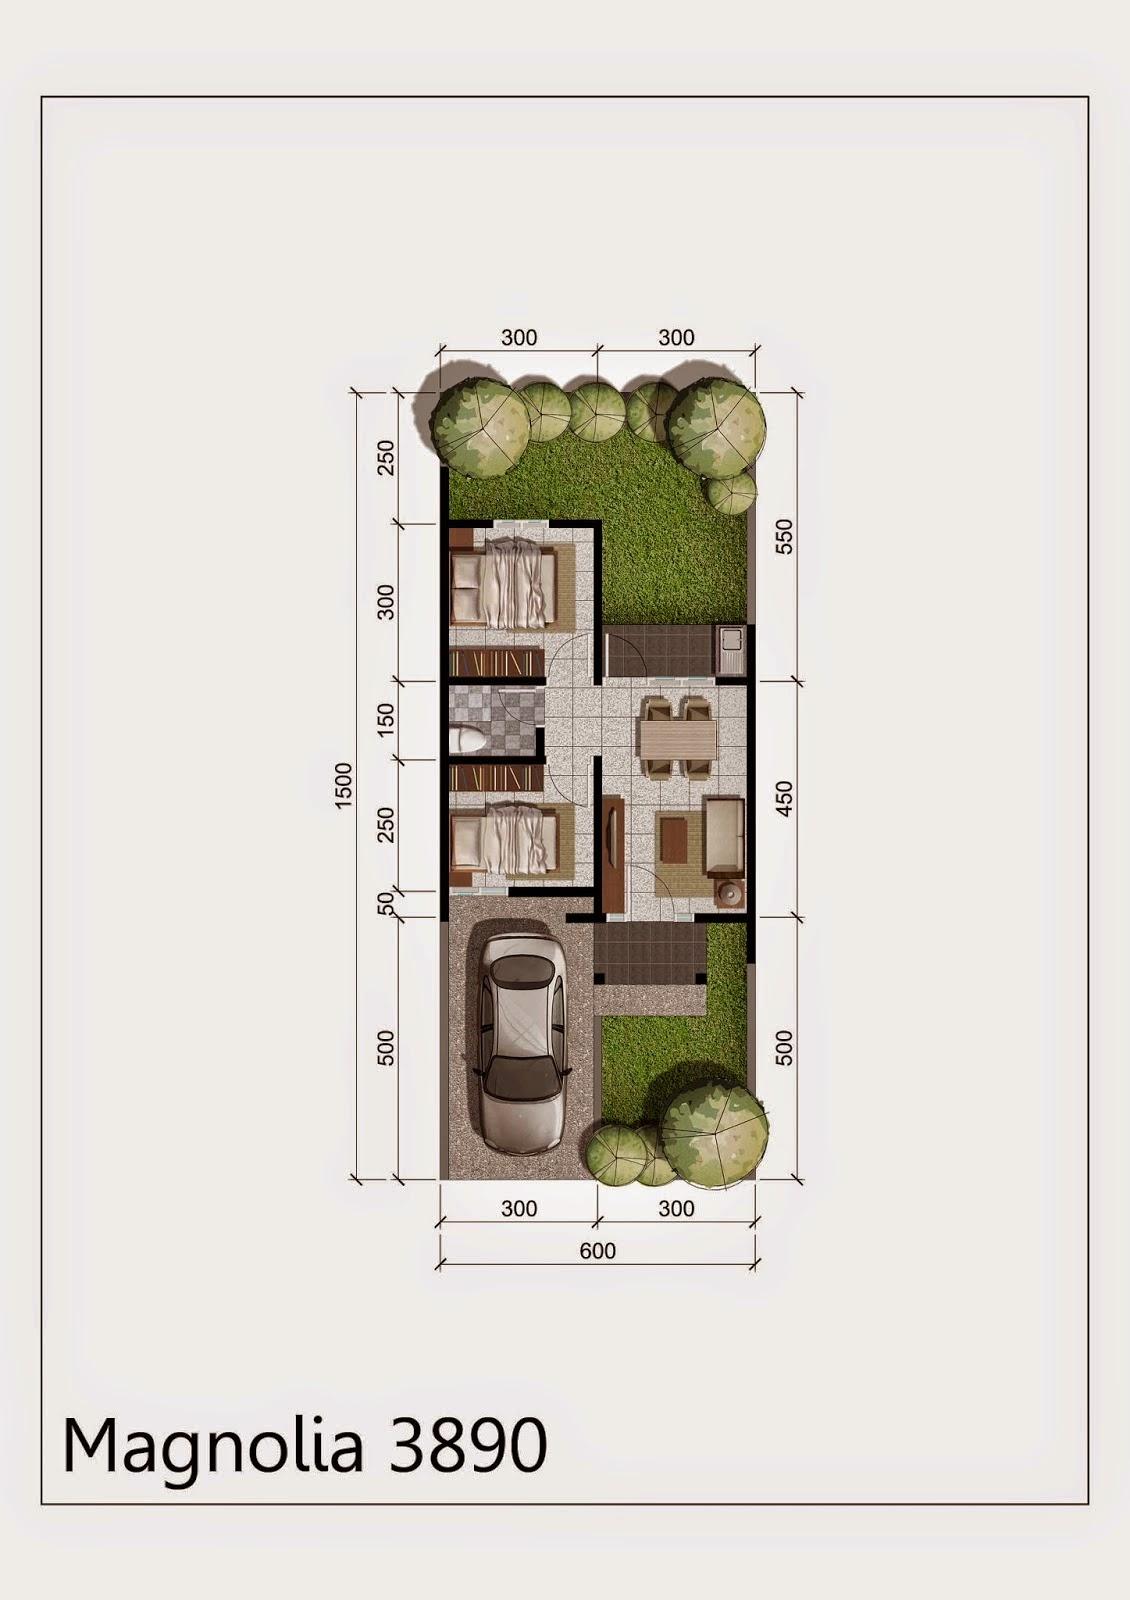 Denah Rumah Bukit Magnolia Citra Indah